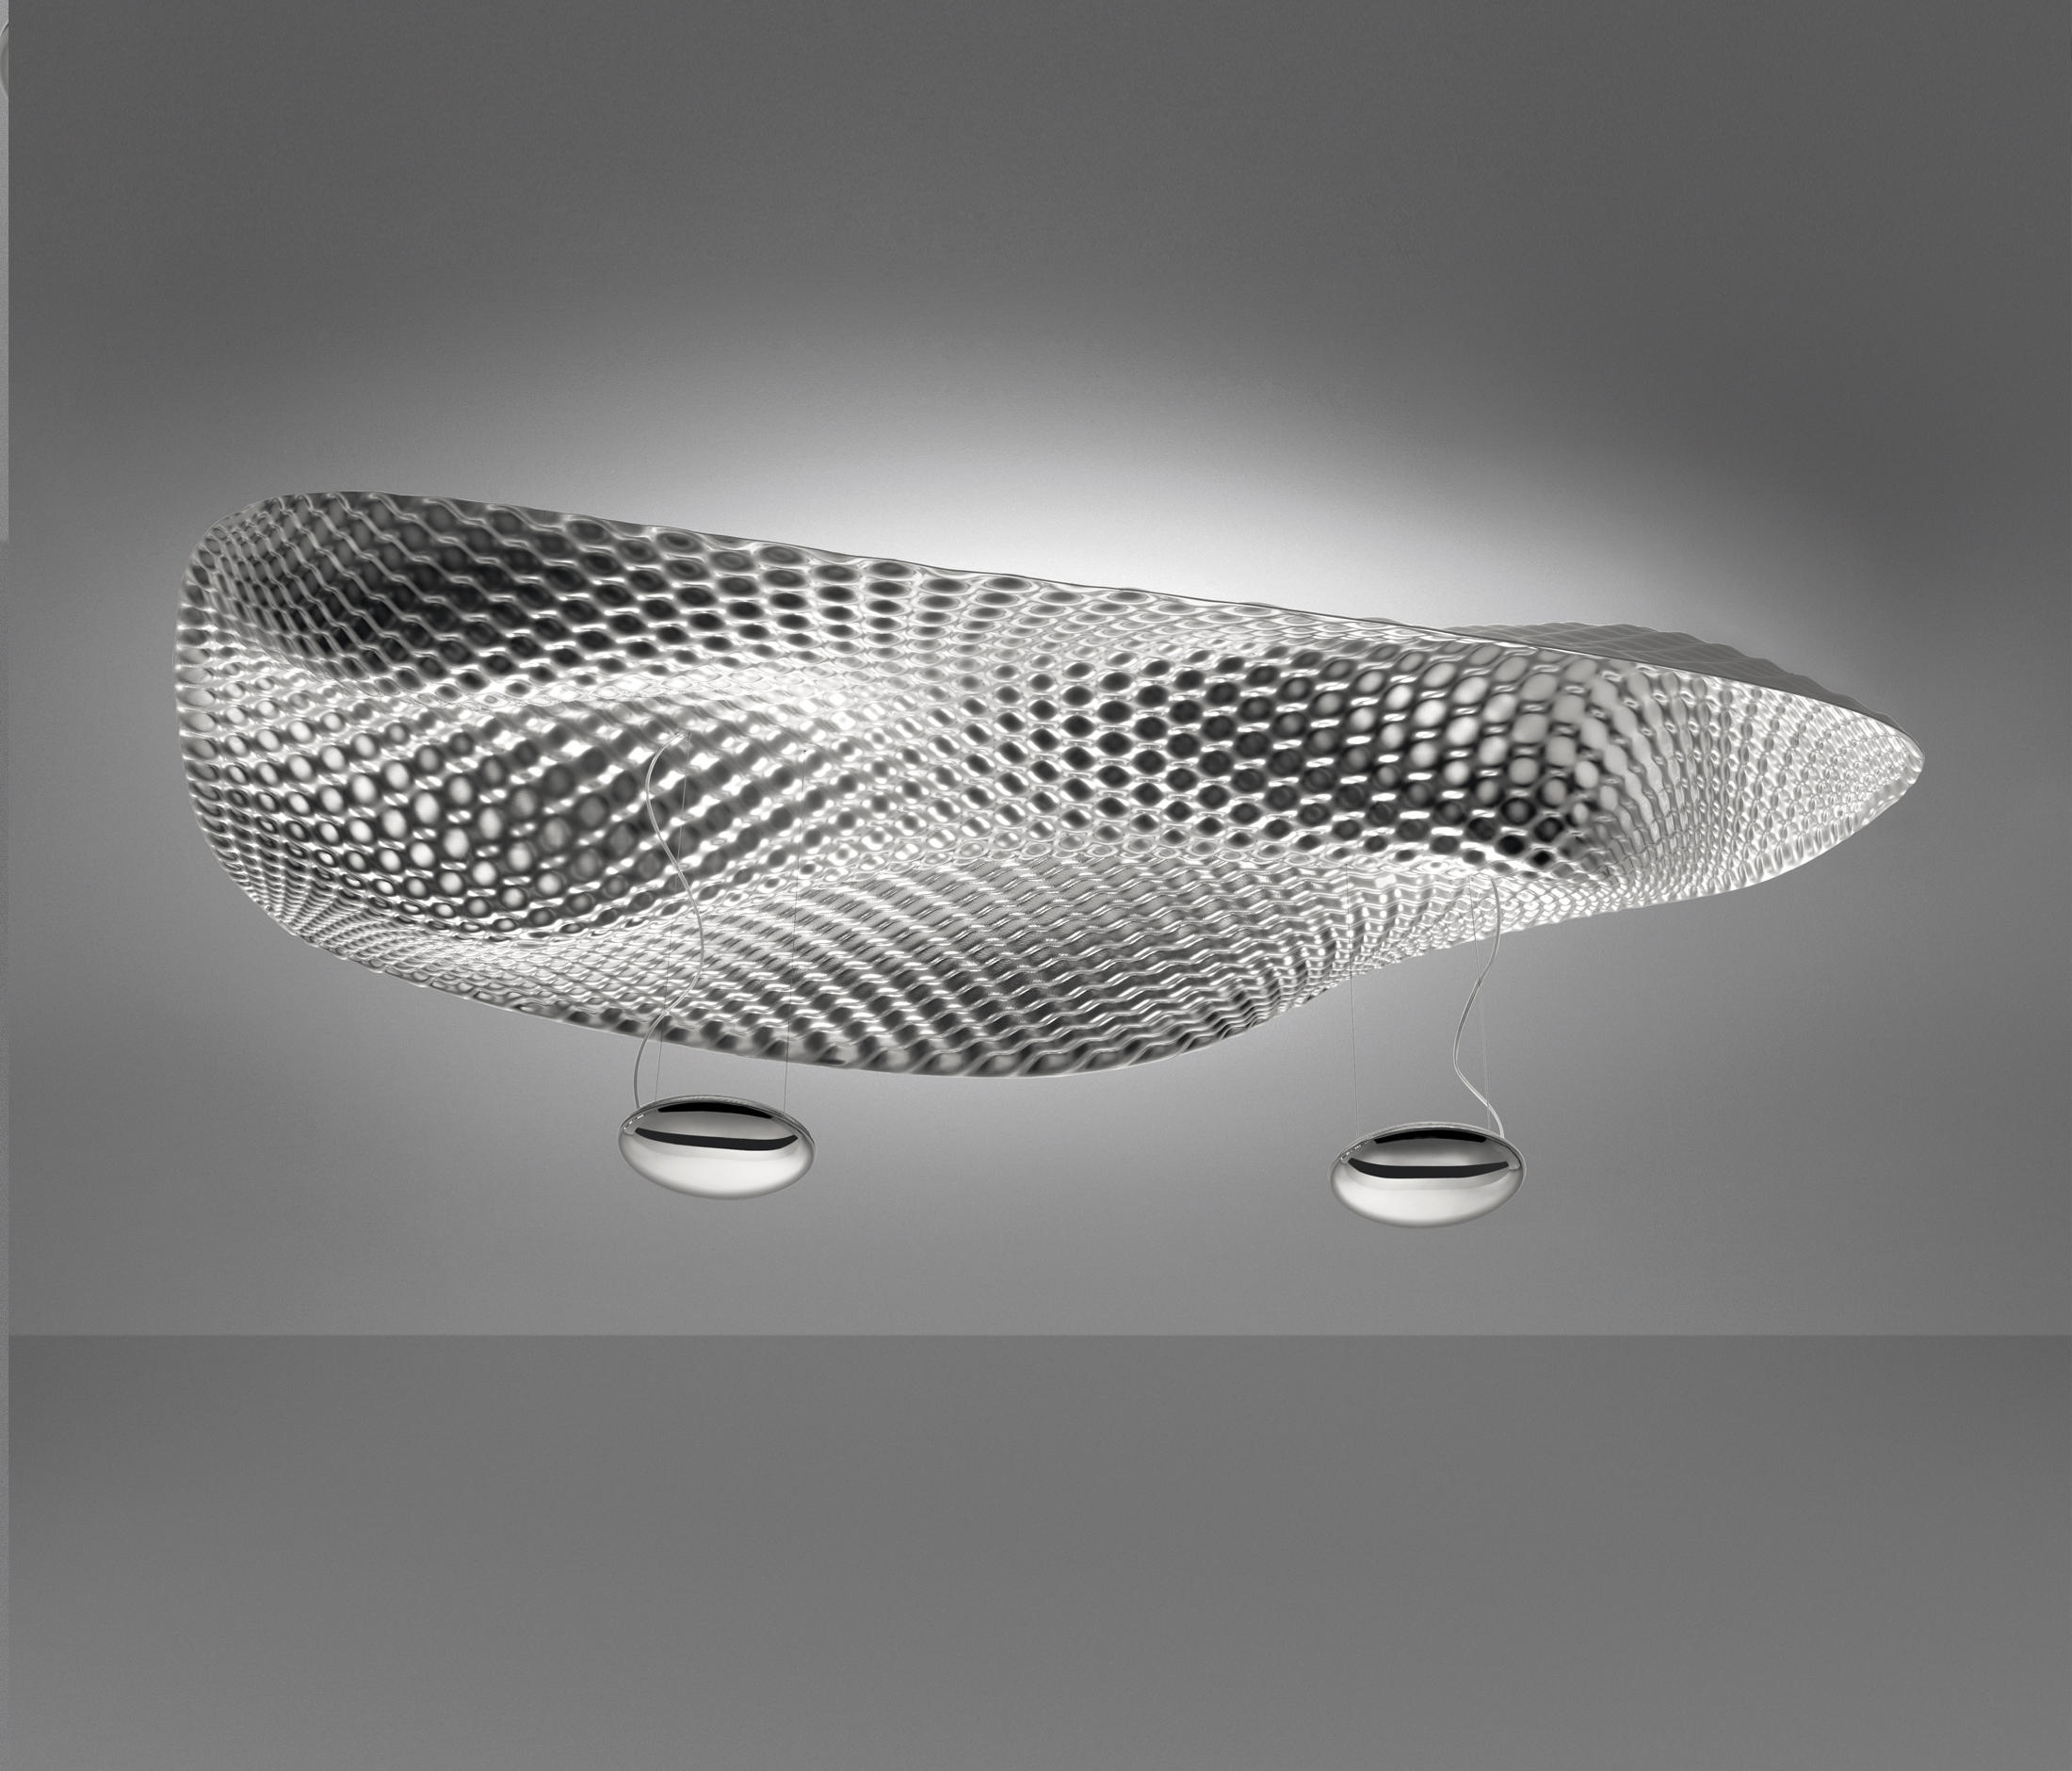 cosmic angel ceiling lamp ceiling lights from artemide architonic. Black Bedroom Furniture Sets. Home Design Ideas